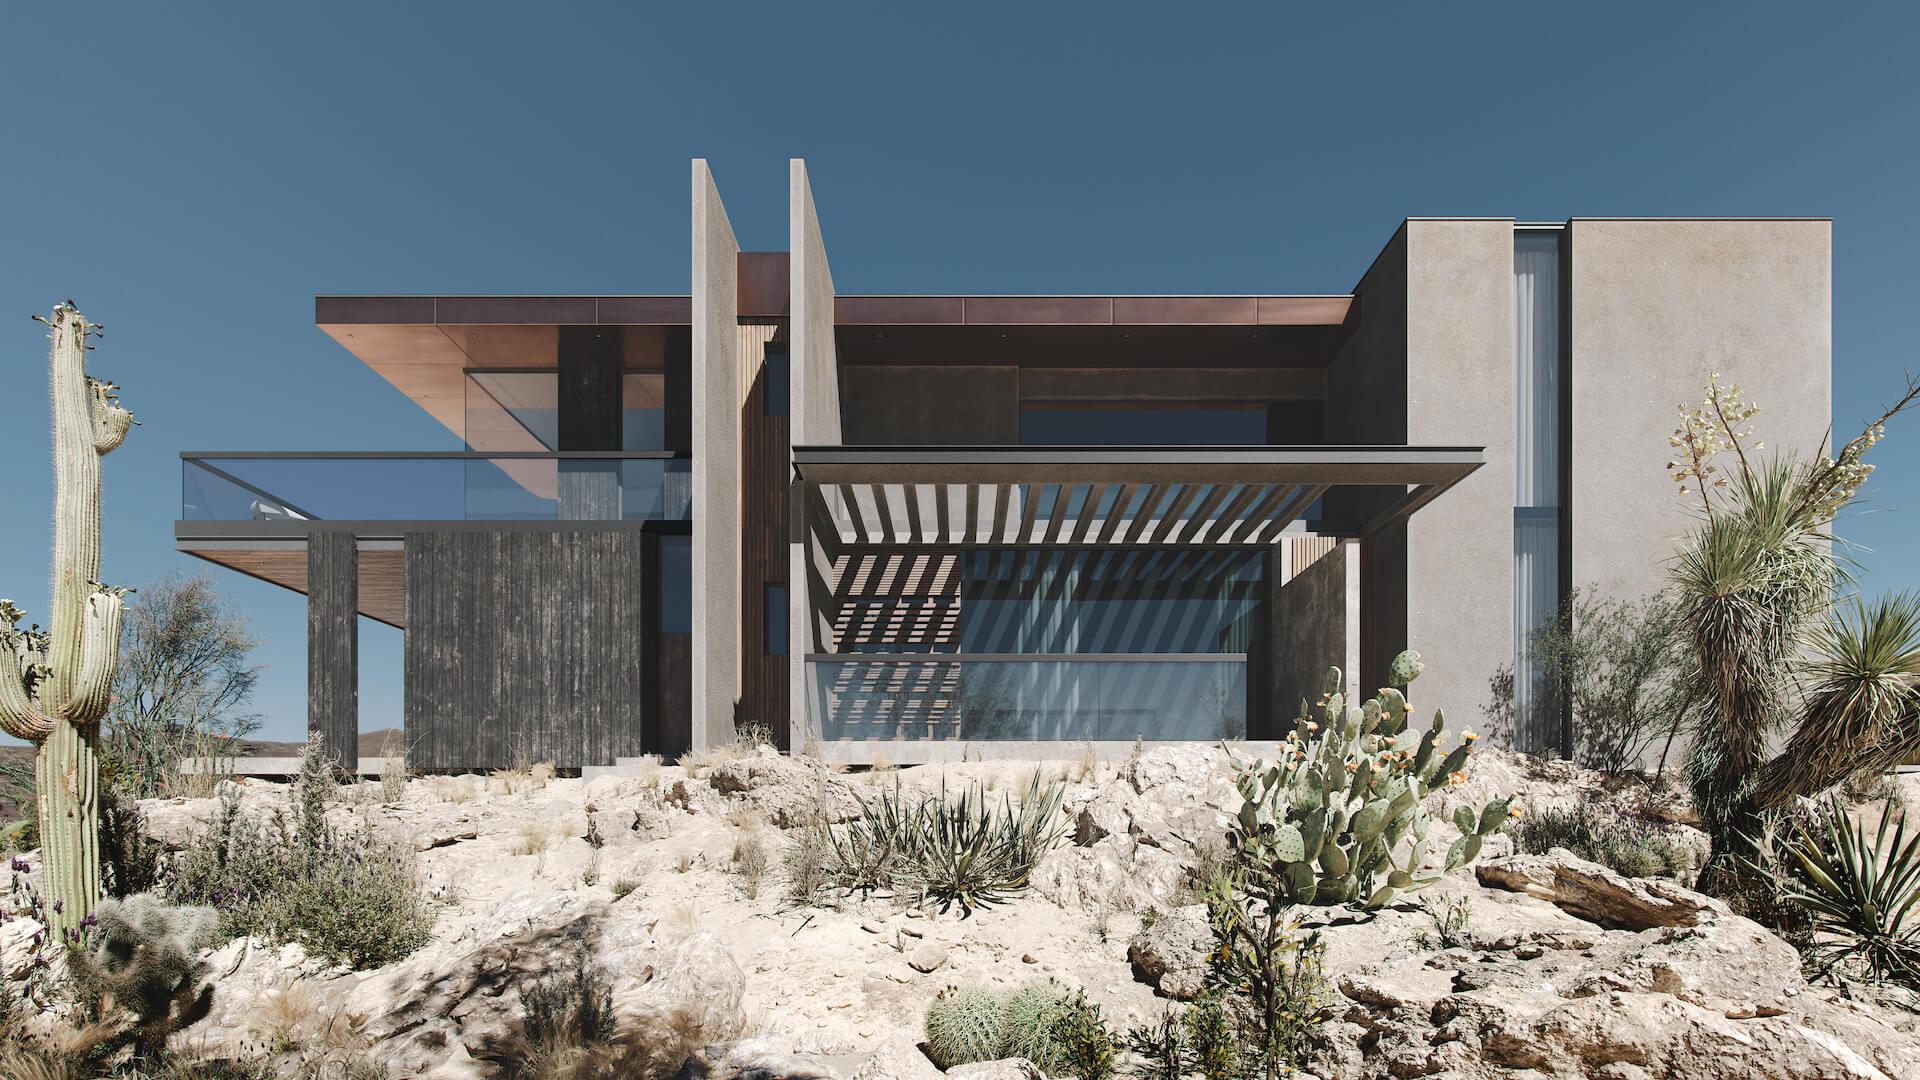 Photorealistic 3D Visualization of a Stylish Modern House